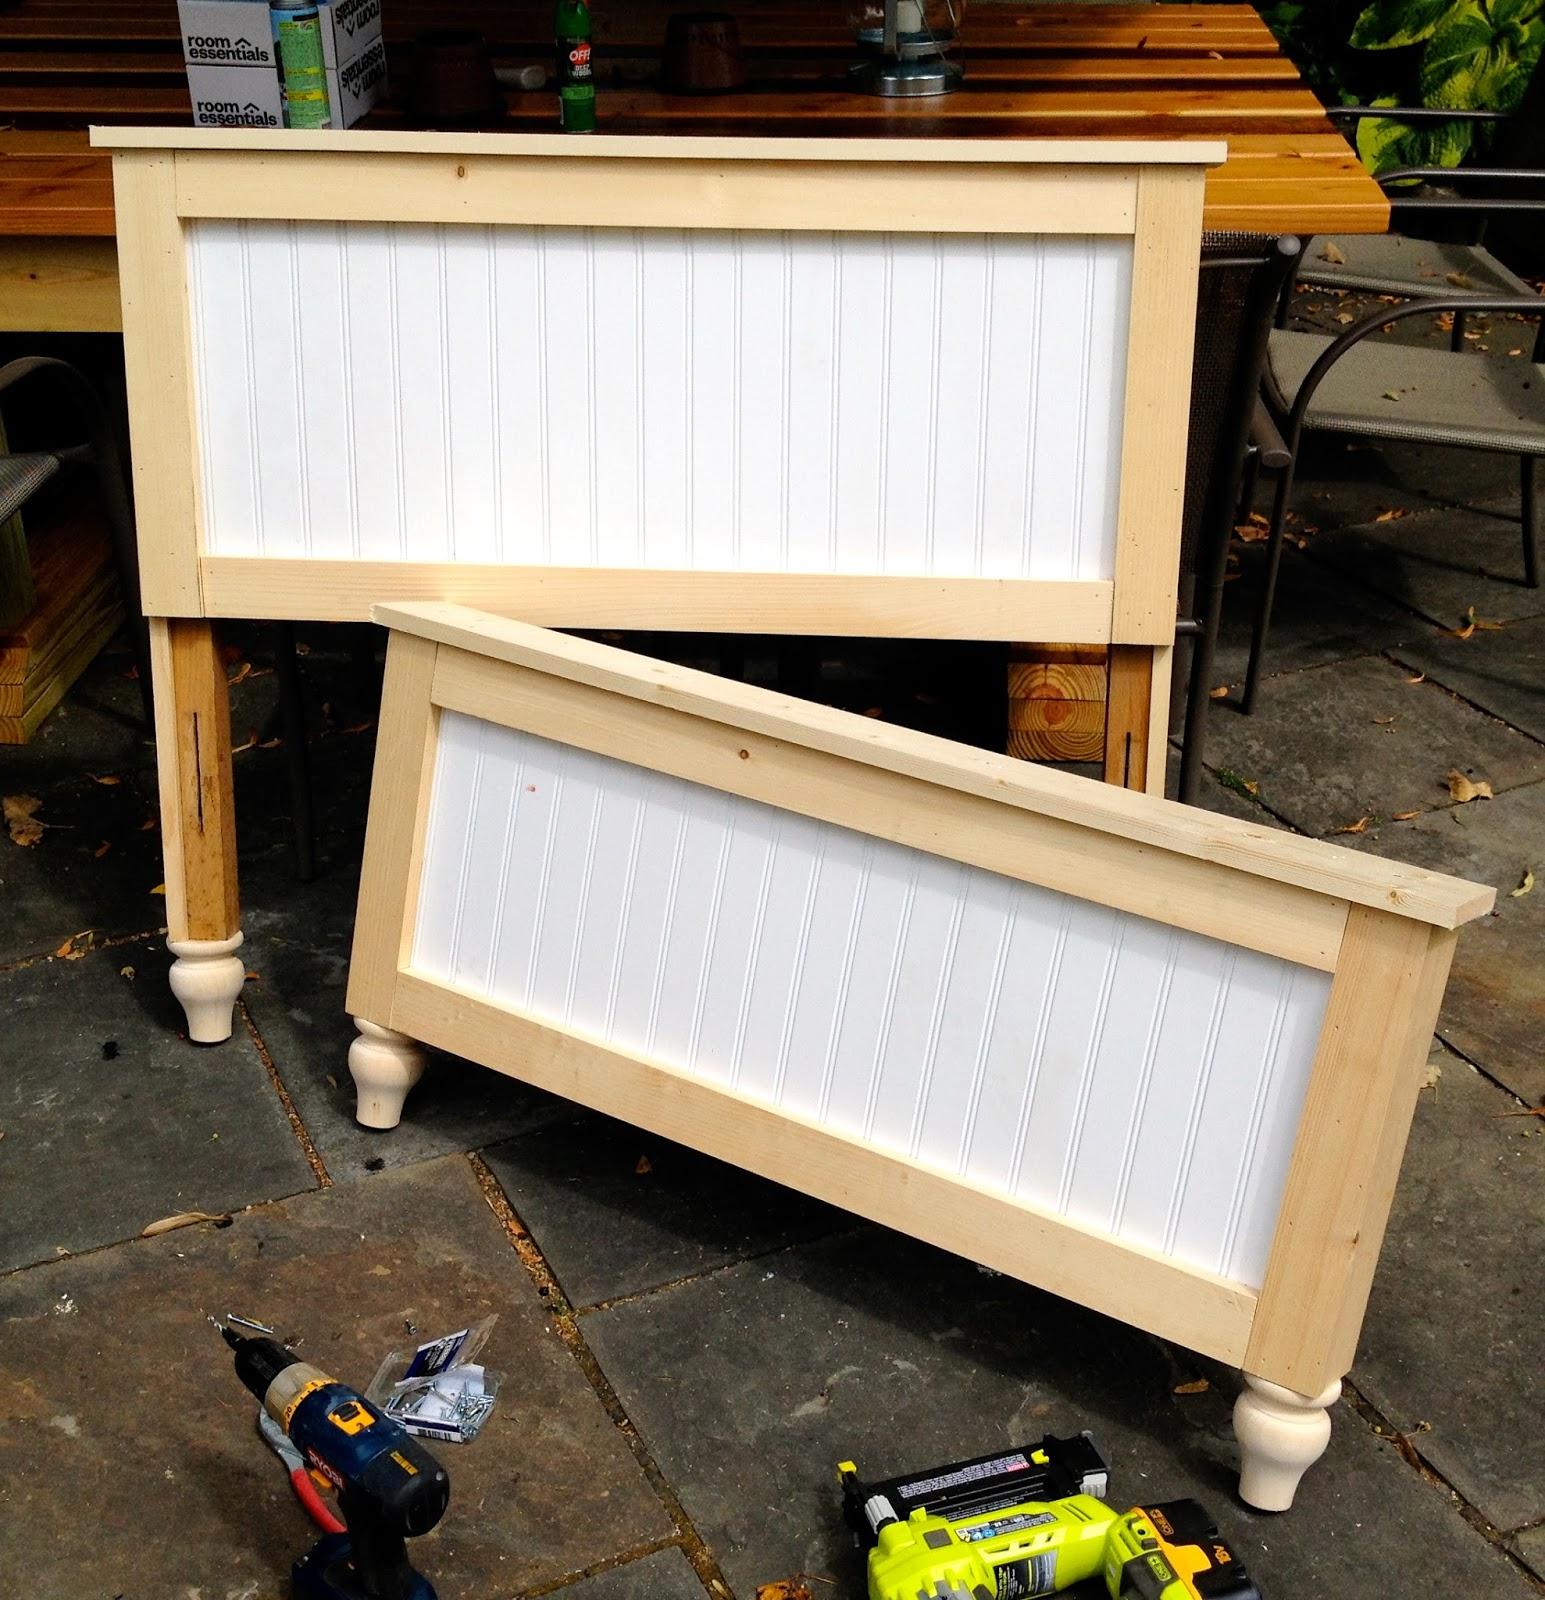 rebuild of headboard and footboard